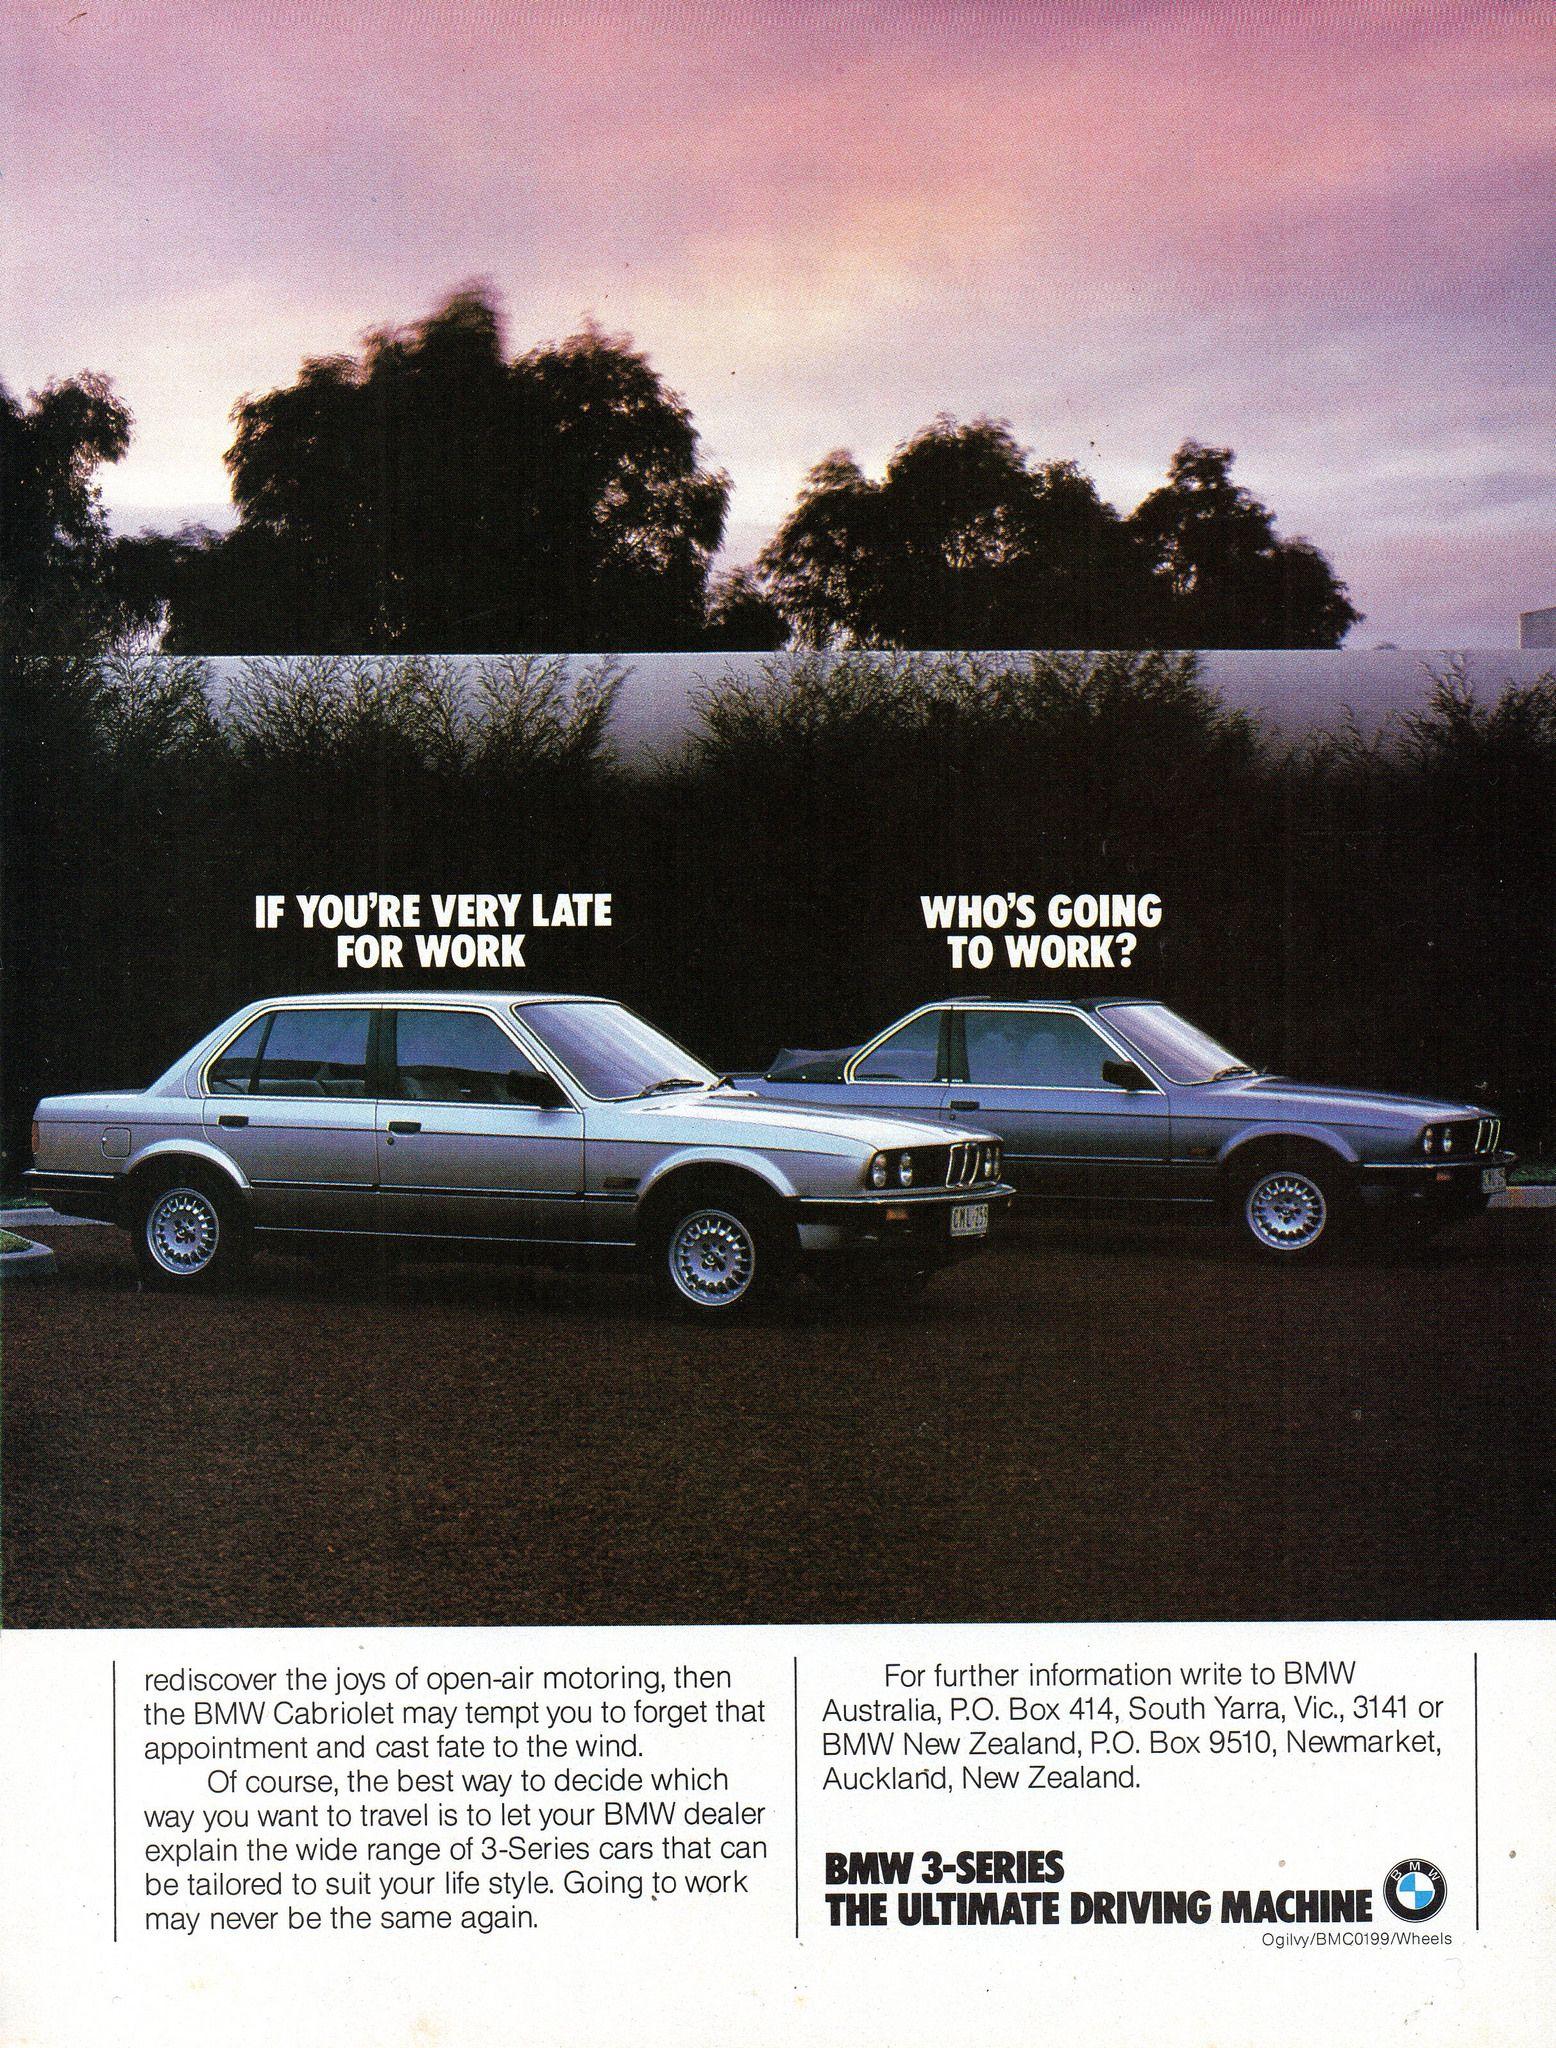 1985 BMW 318i 3 Series Sedan Coupe Cabriolet Page 2 Aussie Original Magazine Advertisement